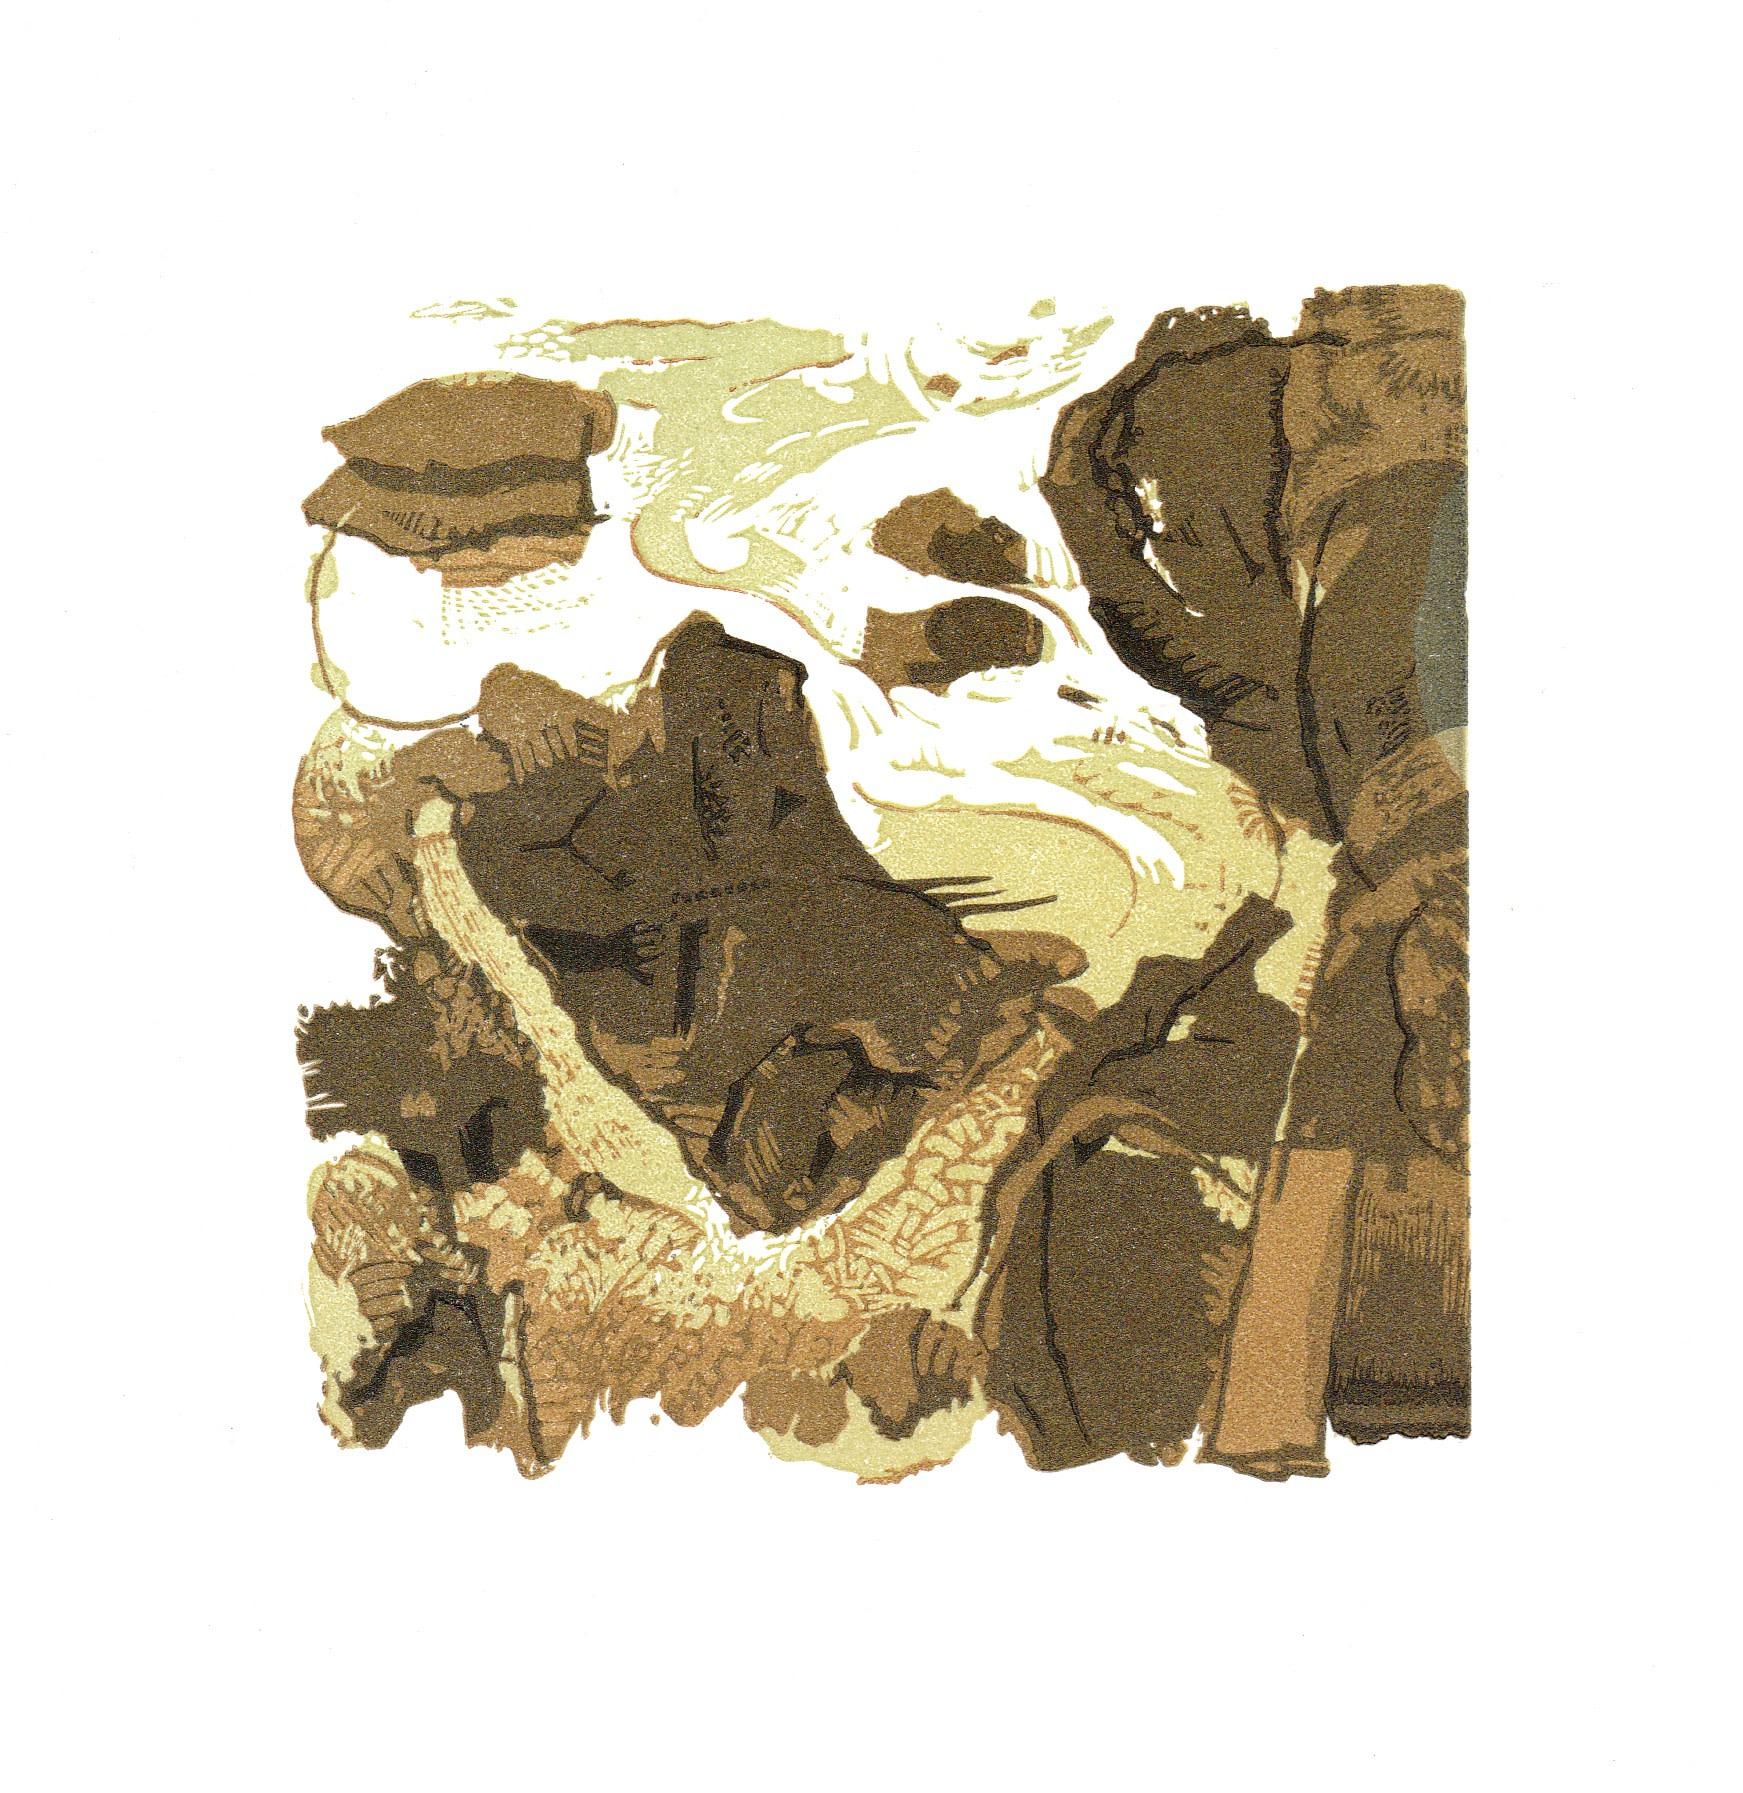 "<span class=""link fancybox-details-link""><a href=""/exhibitions/23/works/artworks_standalone11336/"">View Detail Page</a></span><div class=""artist""><span class=""artist""><strong>Roy Willingham RE</strong></span></div><div class=""title""><em>The Rocks and River - warm version</em></div><div class=""medium"">linocut</div><div class=""dimensions"">30 x 21 cm paper size<br>10 x 10 cm image size</div><div class=""edition_details"">1/1</div>"